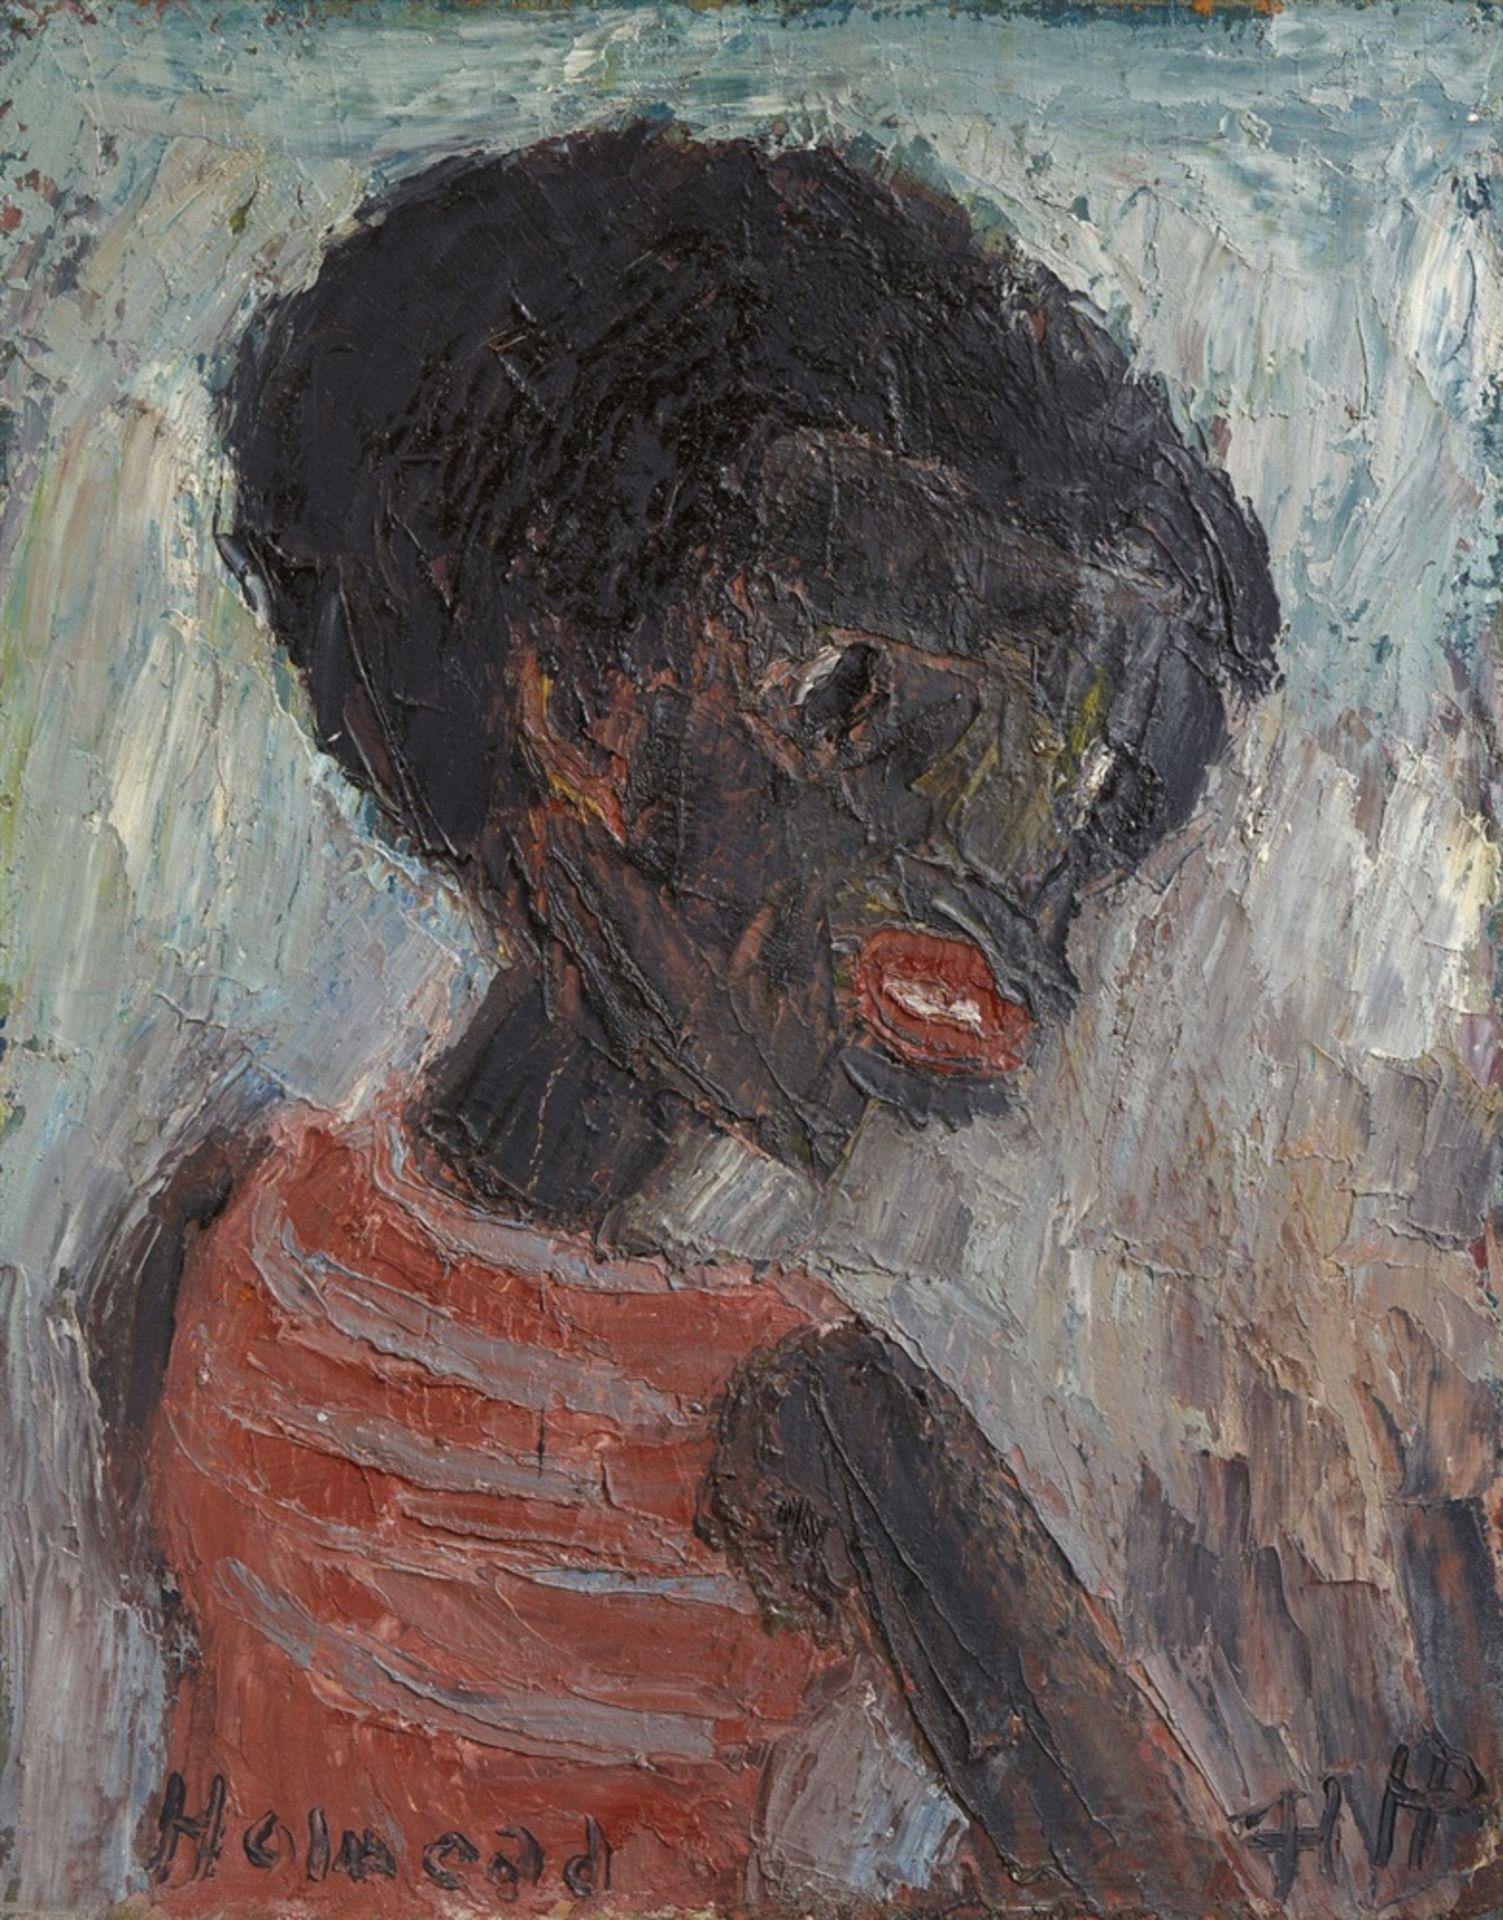 Holmead (Clifford Holmead Philipps)Schwarzer Junge